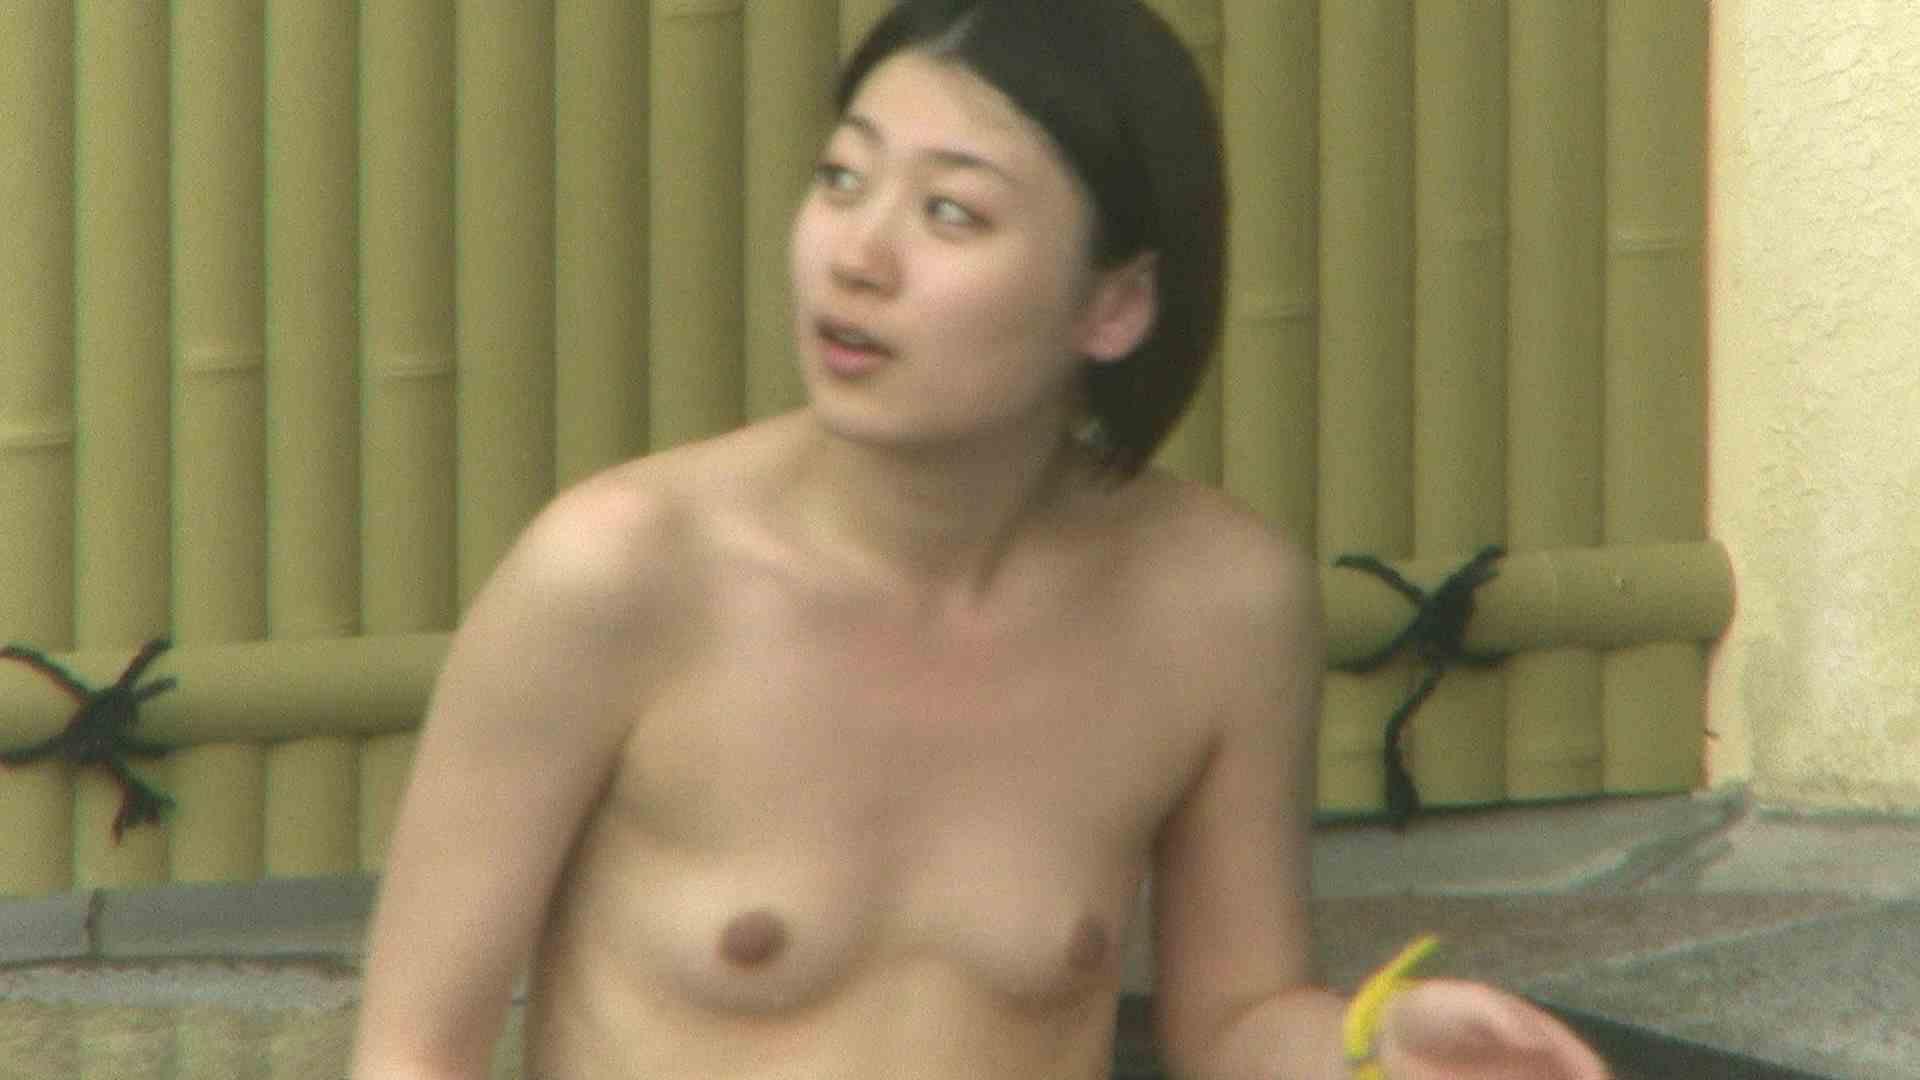 Aquaな露天風呂Vol.123 美しいOLの裸体 | 露天風呂突入  105pic 40